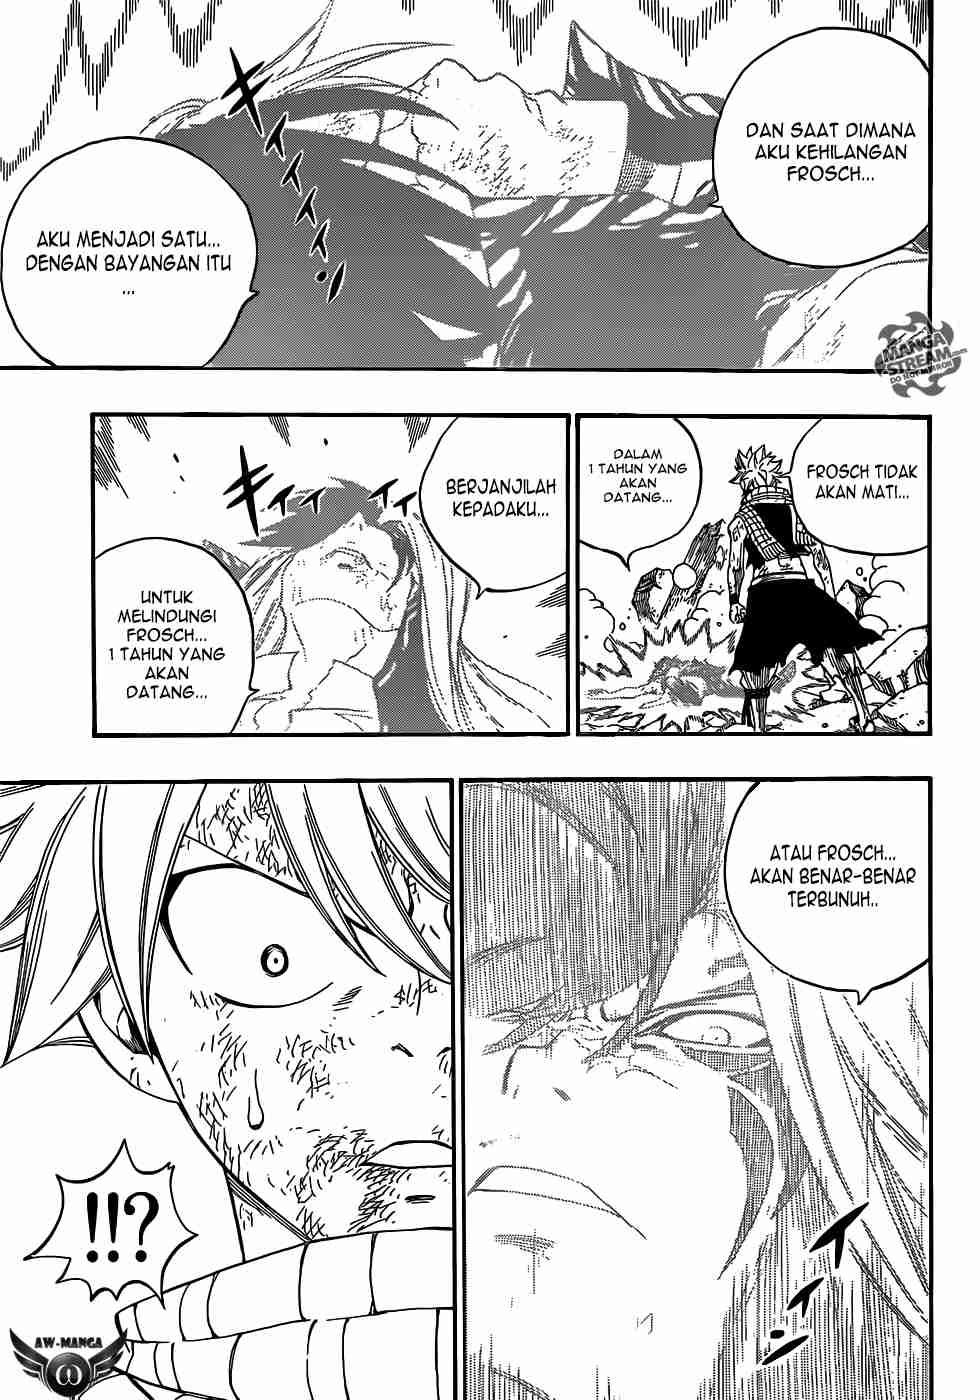 Komik fairy tail 337 - rencana emas 338 Indonesia fairy tail 337 - rencana emas Terbaru 16|Baca Manga Komik Indonesia|Mangacan